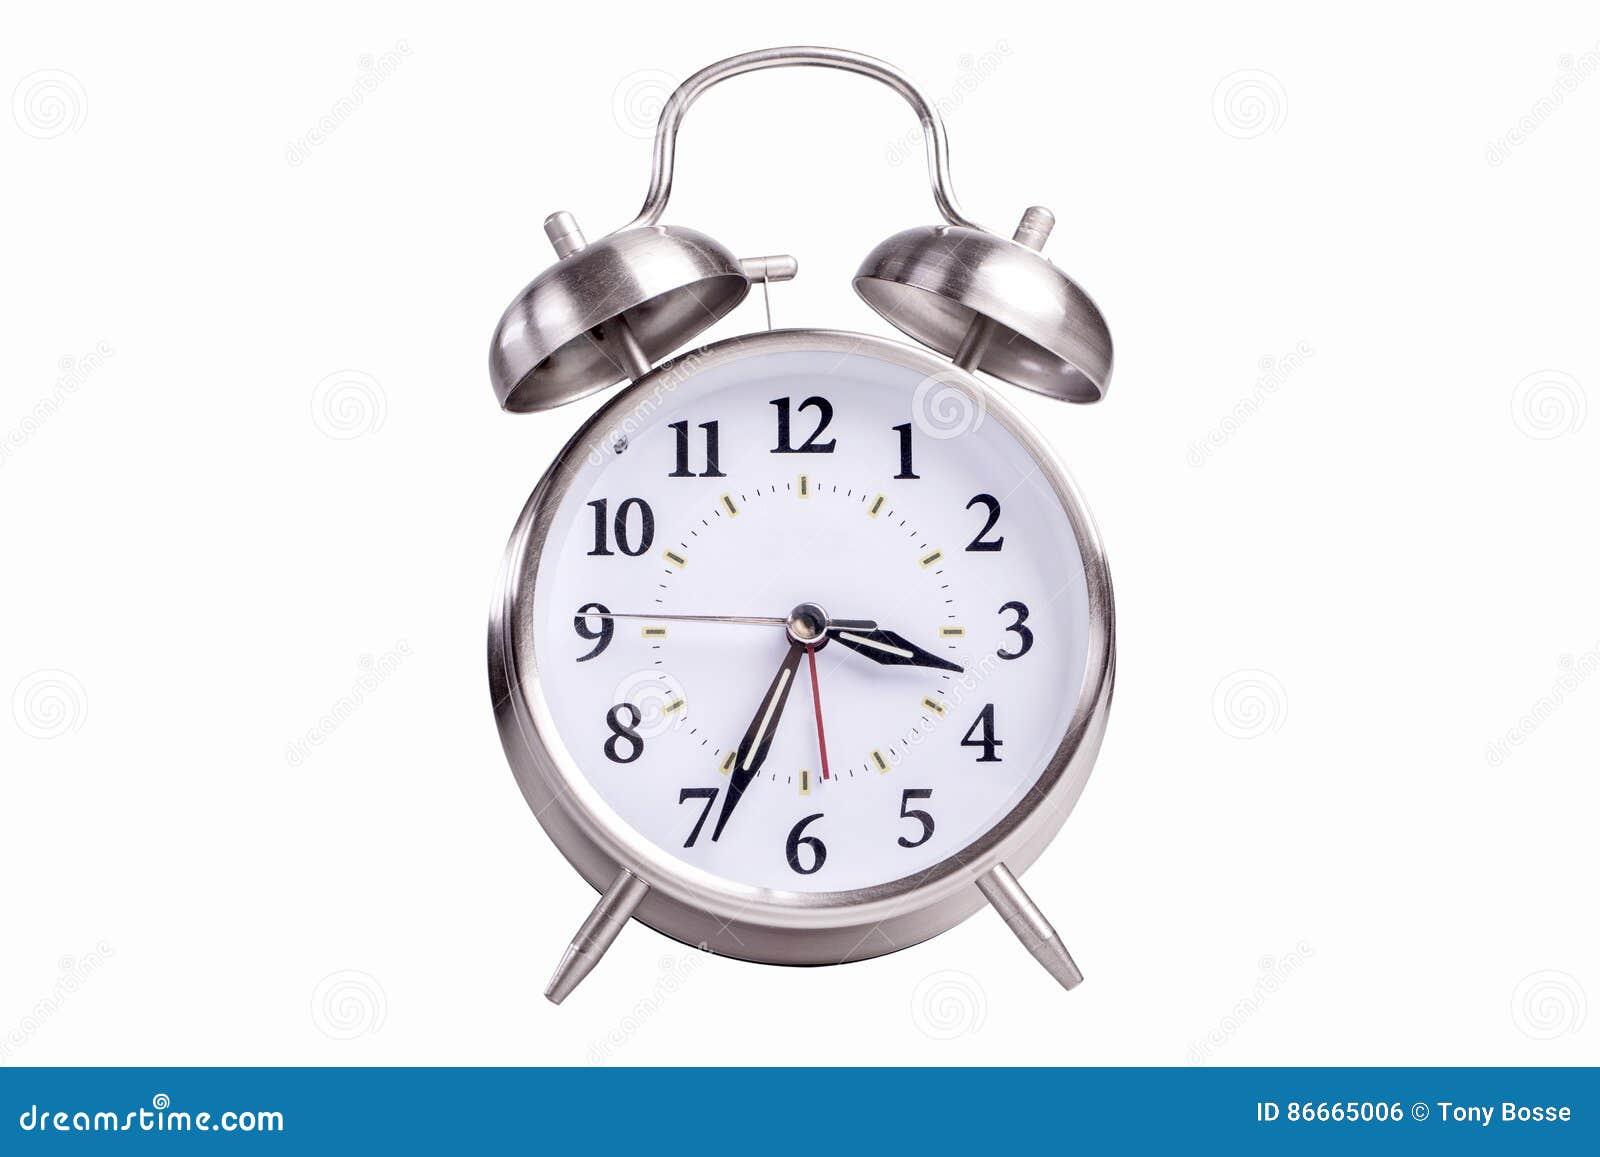 Horloge d alarme analogique